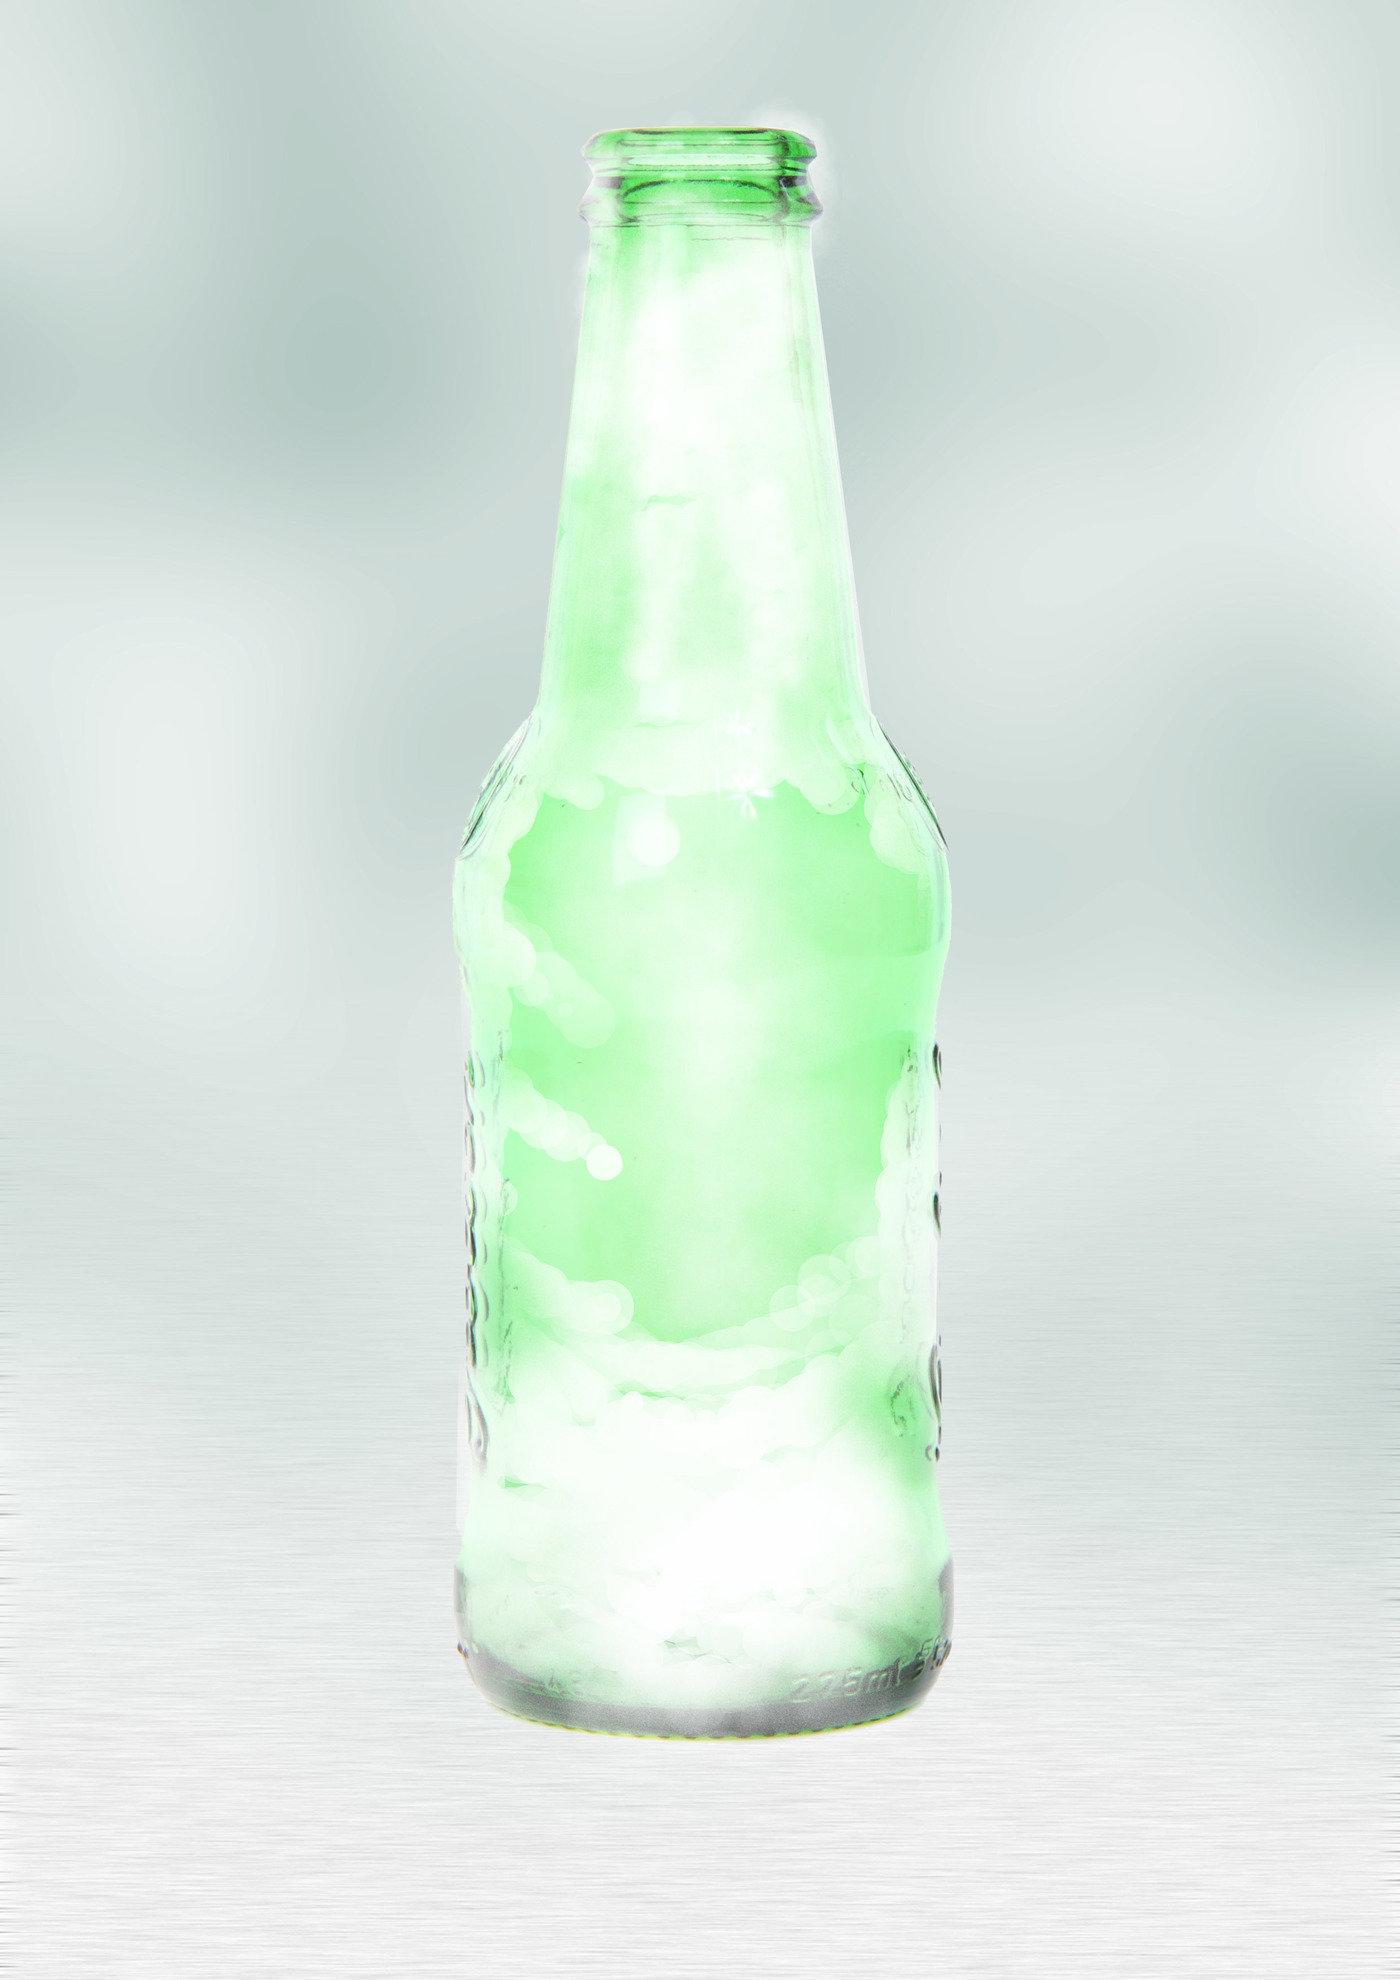 Ice Effect(Photoshop) by Yong Yong Liang at Coroflot com